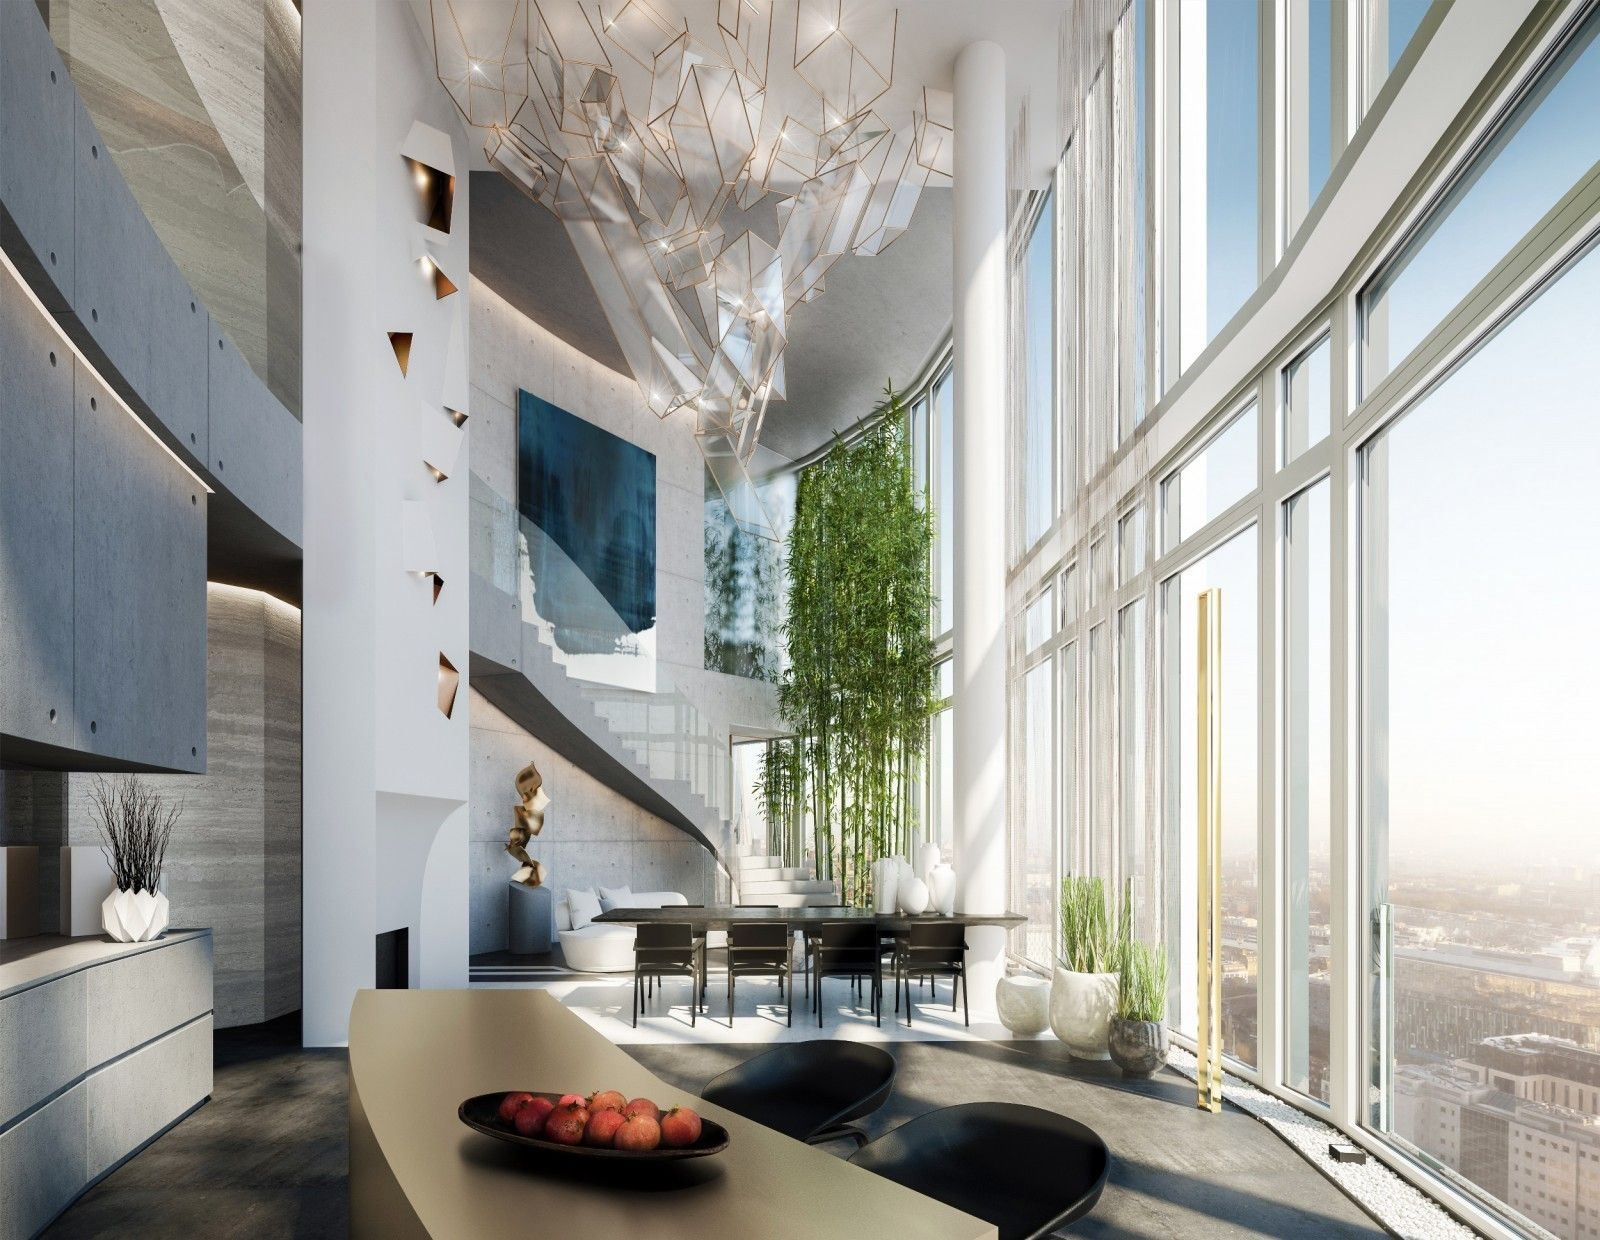 Top 10 Most Expensive London Penthouses Billionaire American